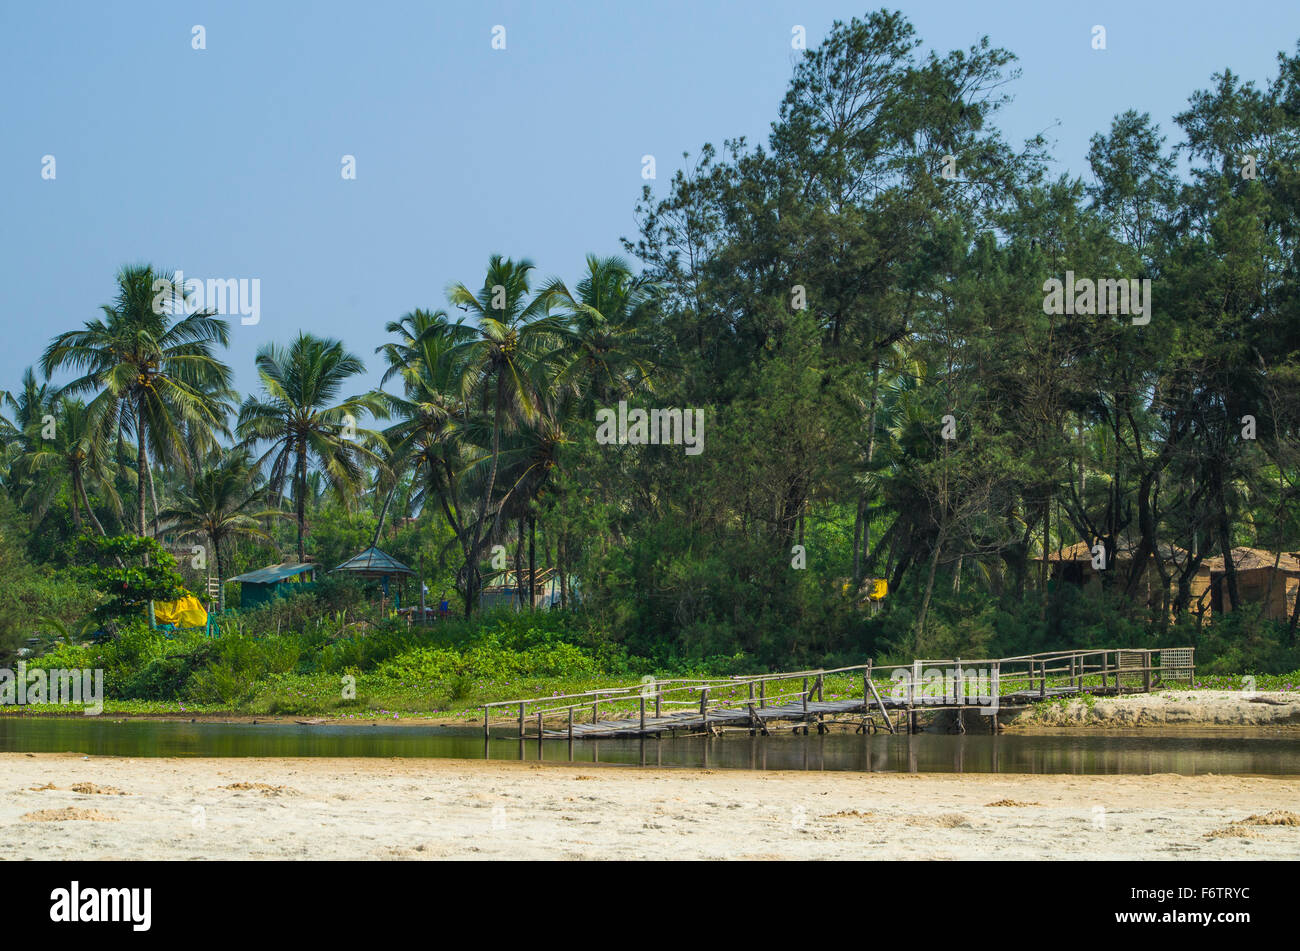 Landscape India  palm grove - Stock Image